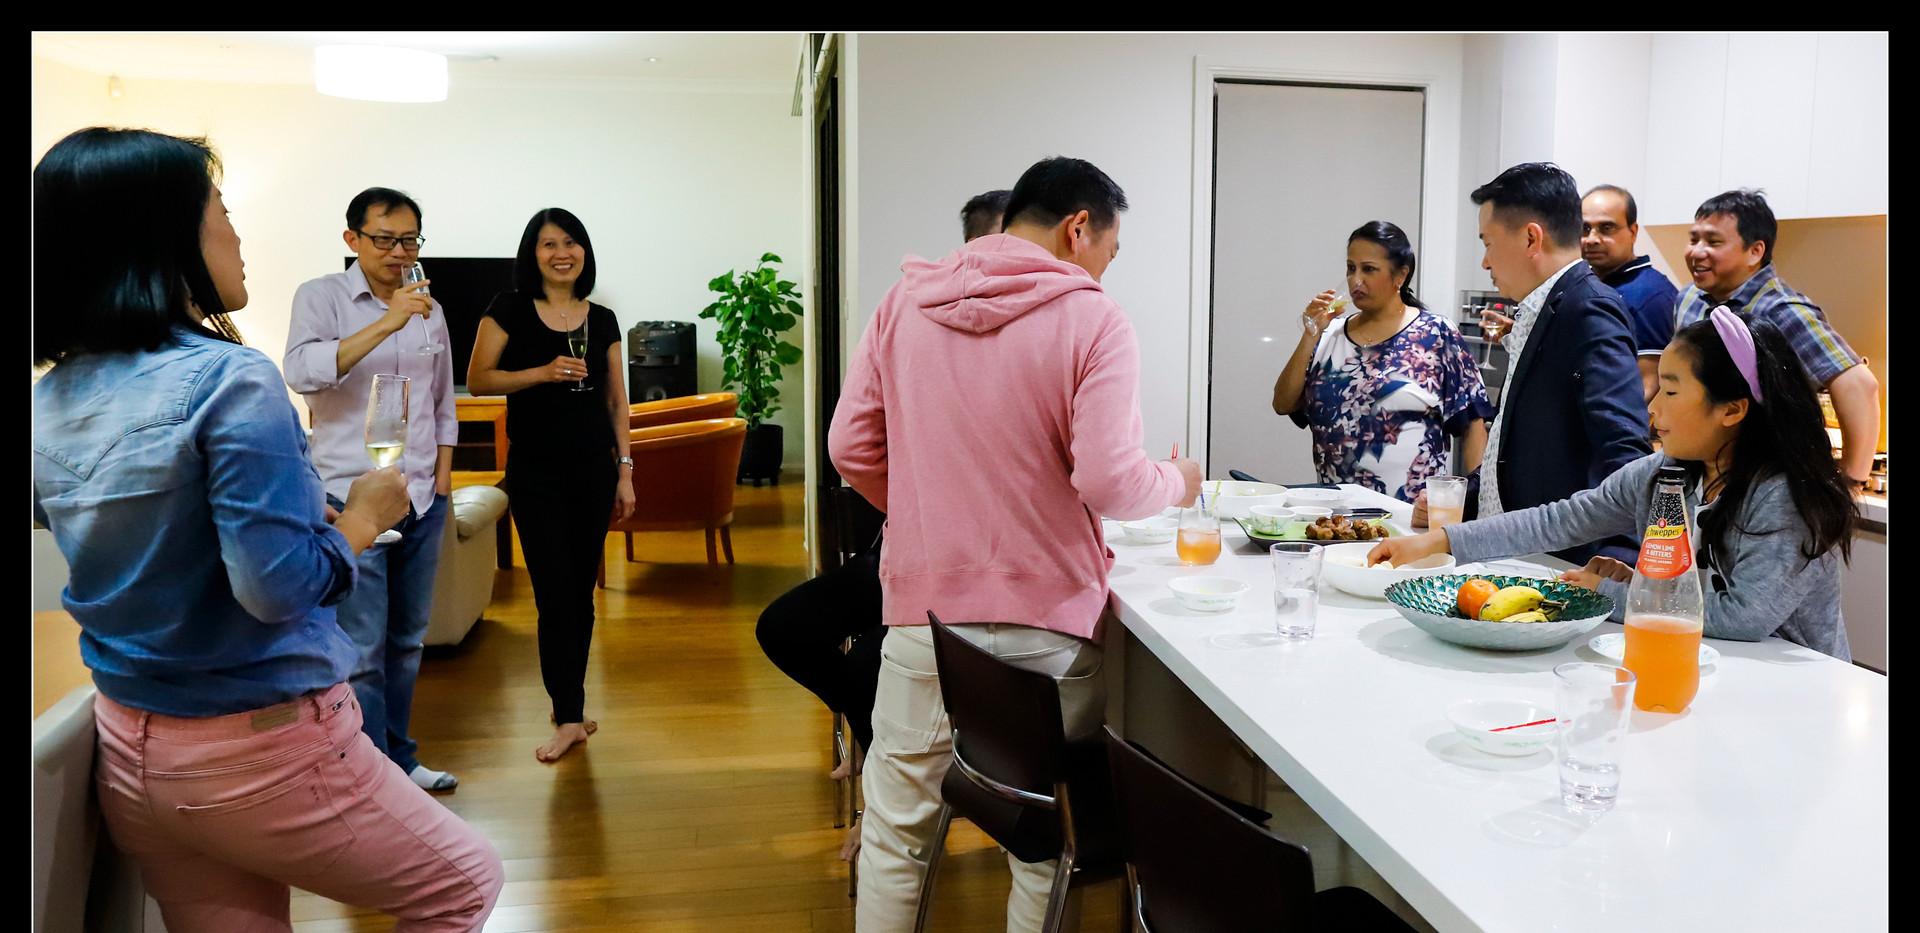 2019_Sydney_Friends_2505.jpg